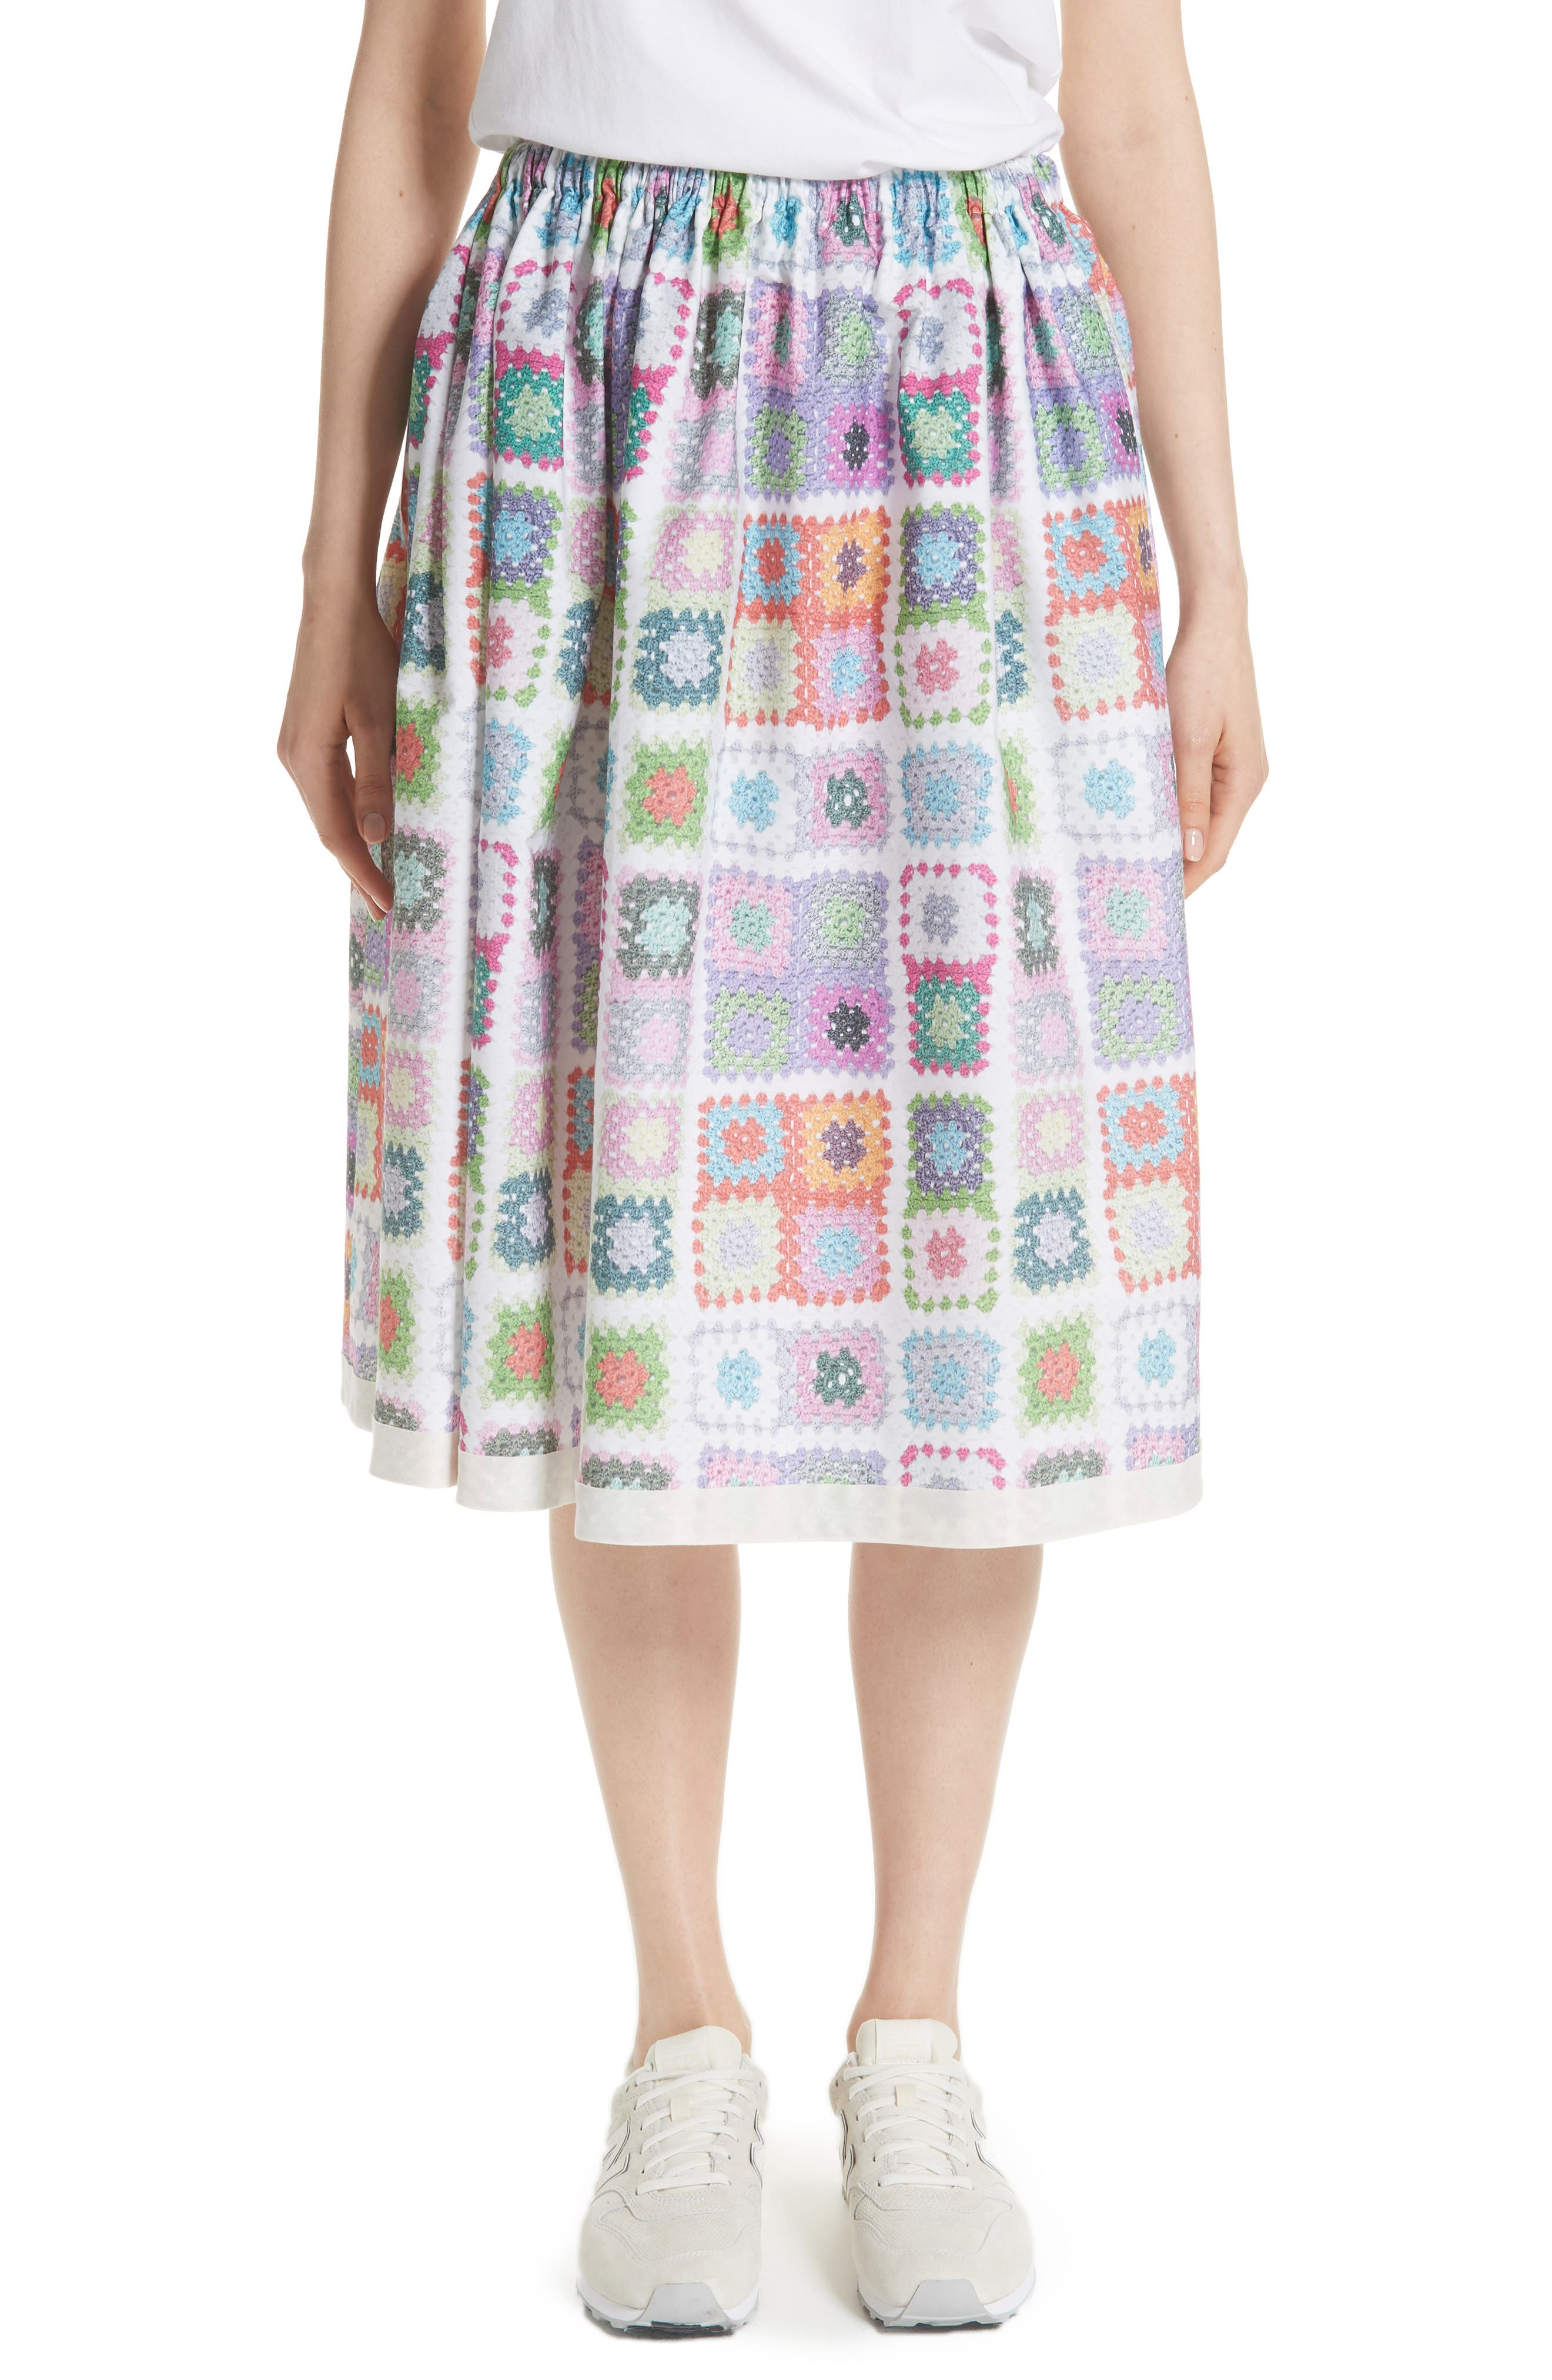 Tricot Comme des Garçons Crochet Print Skirt